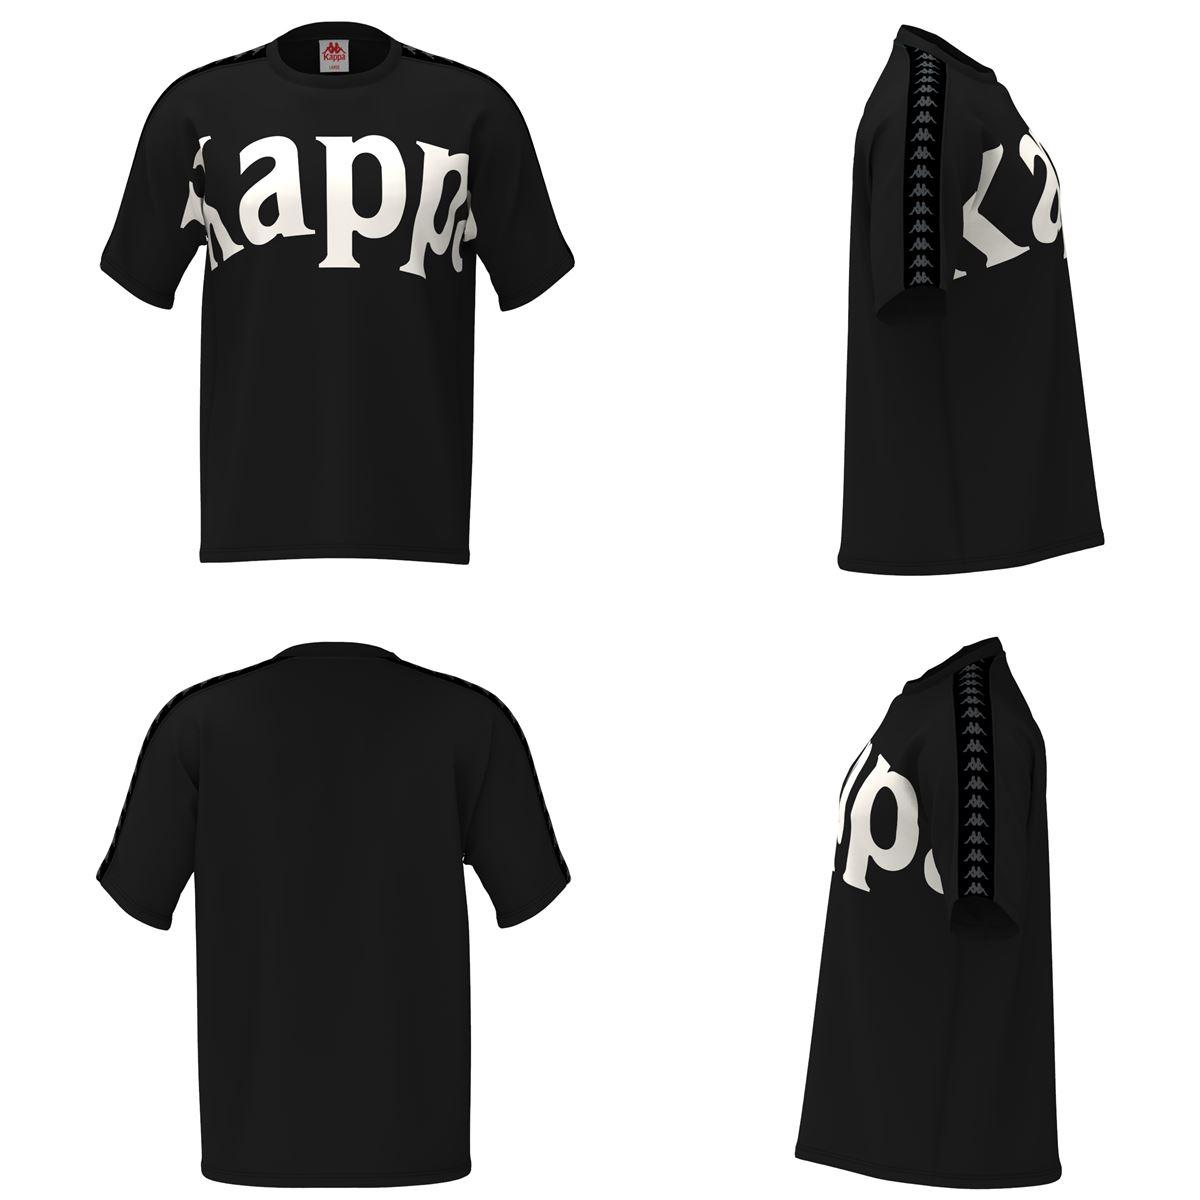 T-SHIRT KAPPA KAPPA | T-shirt m/m | 304S7M0A56